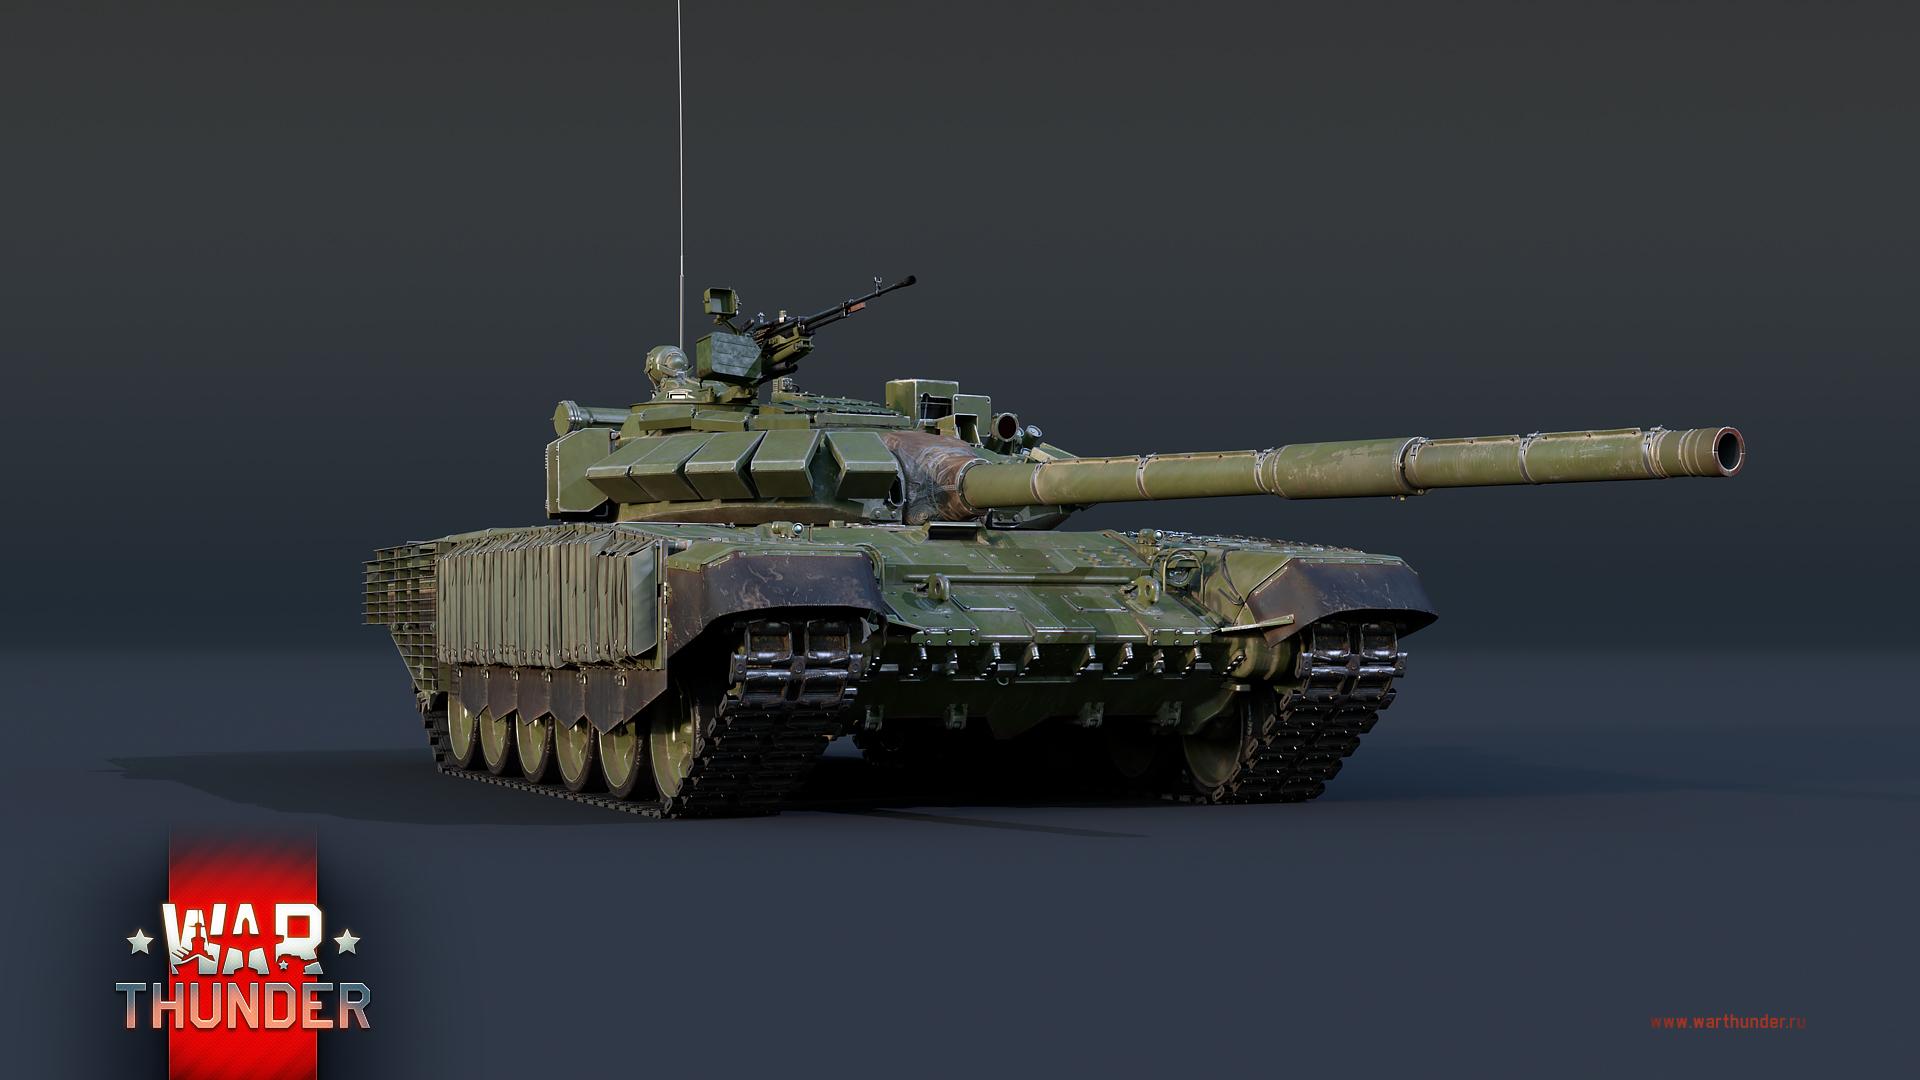 https://static.warthunder.ru/upload/image/!2020/08/DB/t_72b3_1920x1080_logo_ru_7adbbe5636fdb8c650388ad479c92041.jpg